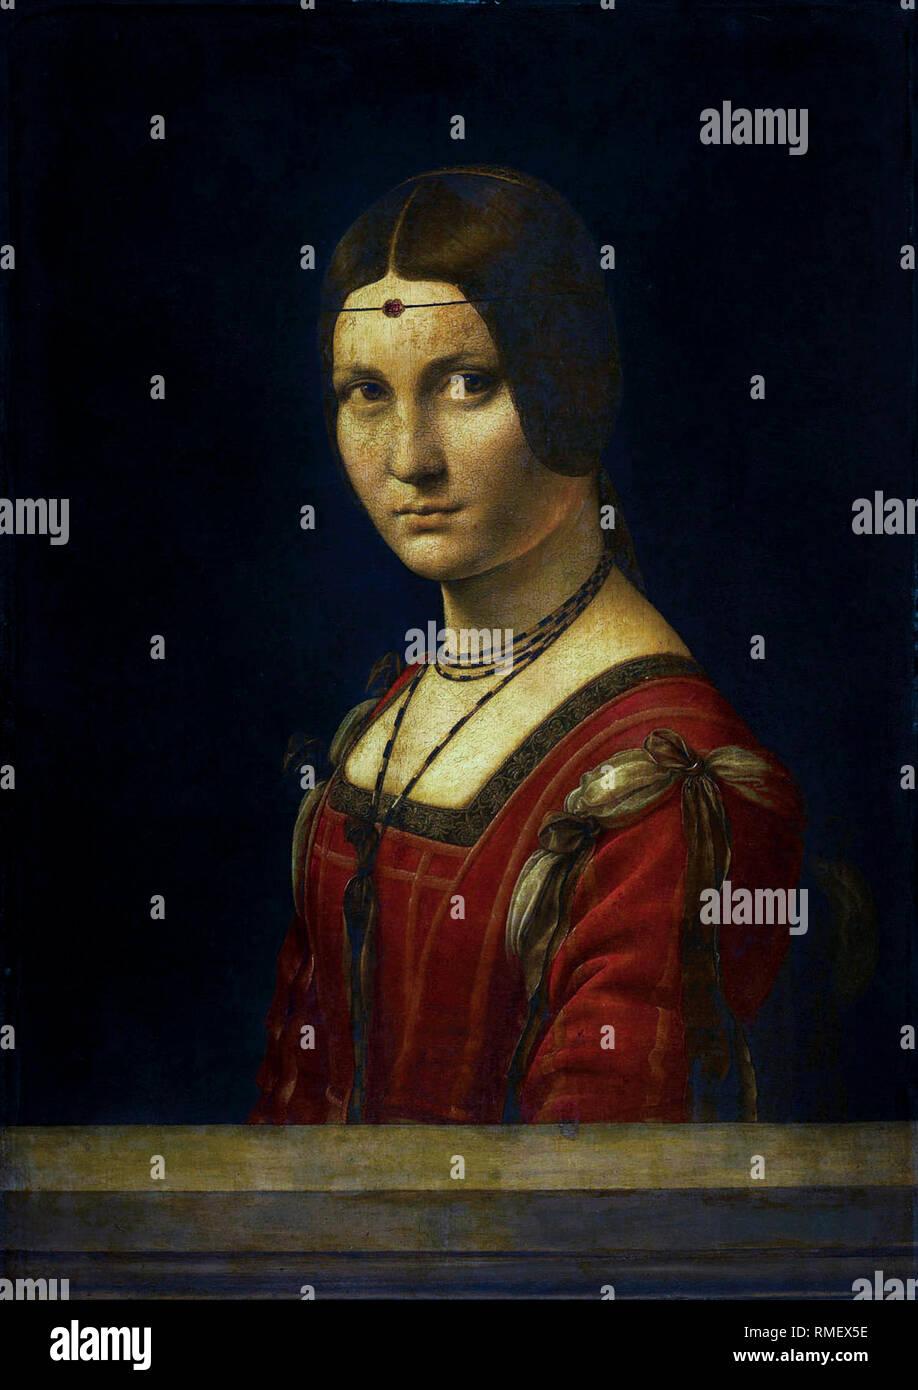 Leonardo da Vinci, Porträt einer unbekannten Frau, La Belle Ferroniere, Malerei c 1496 Stockbild